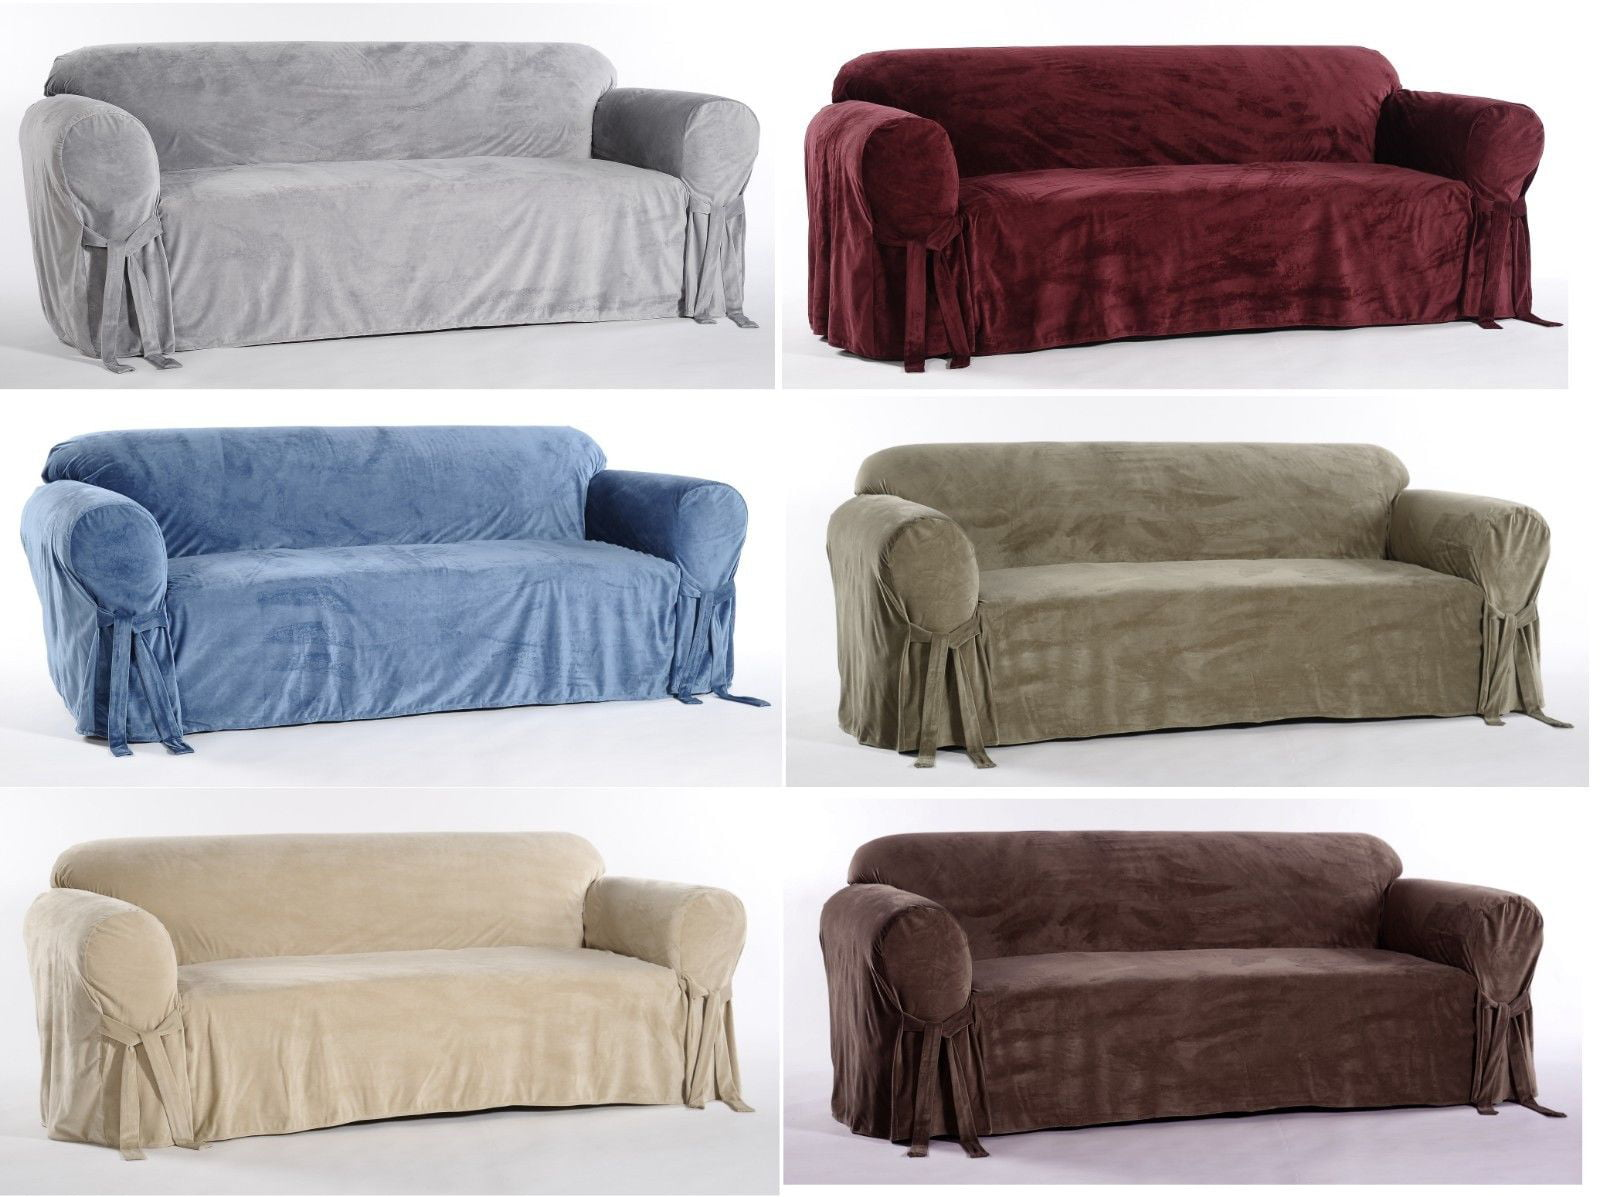 Plush Velvet Microfiber One Piece, Round Couch Slipcovers